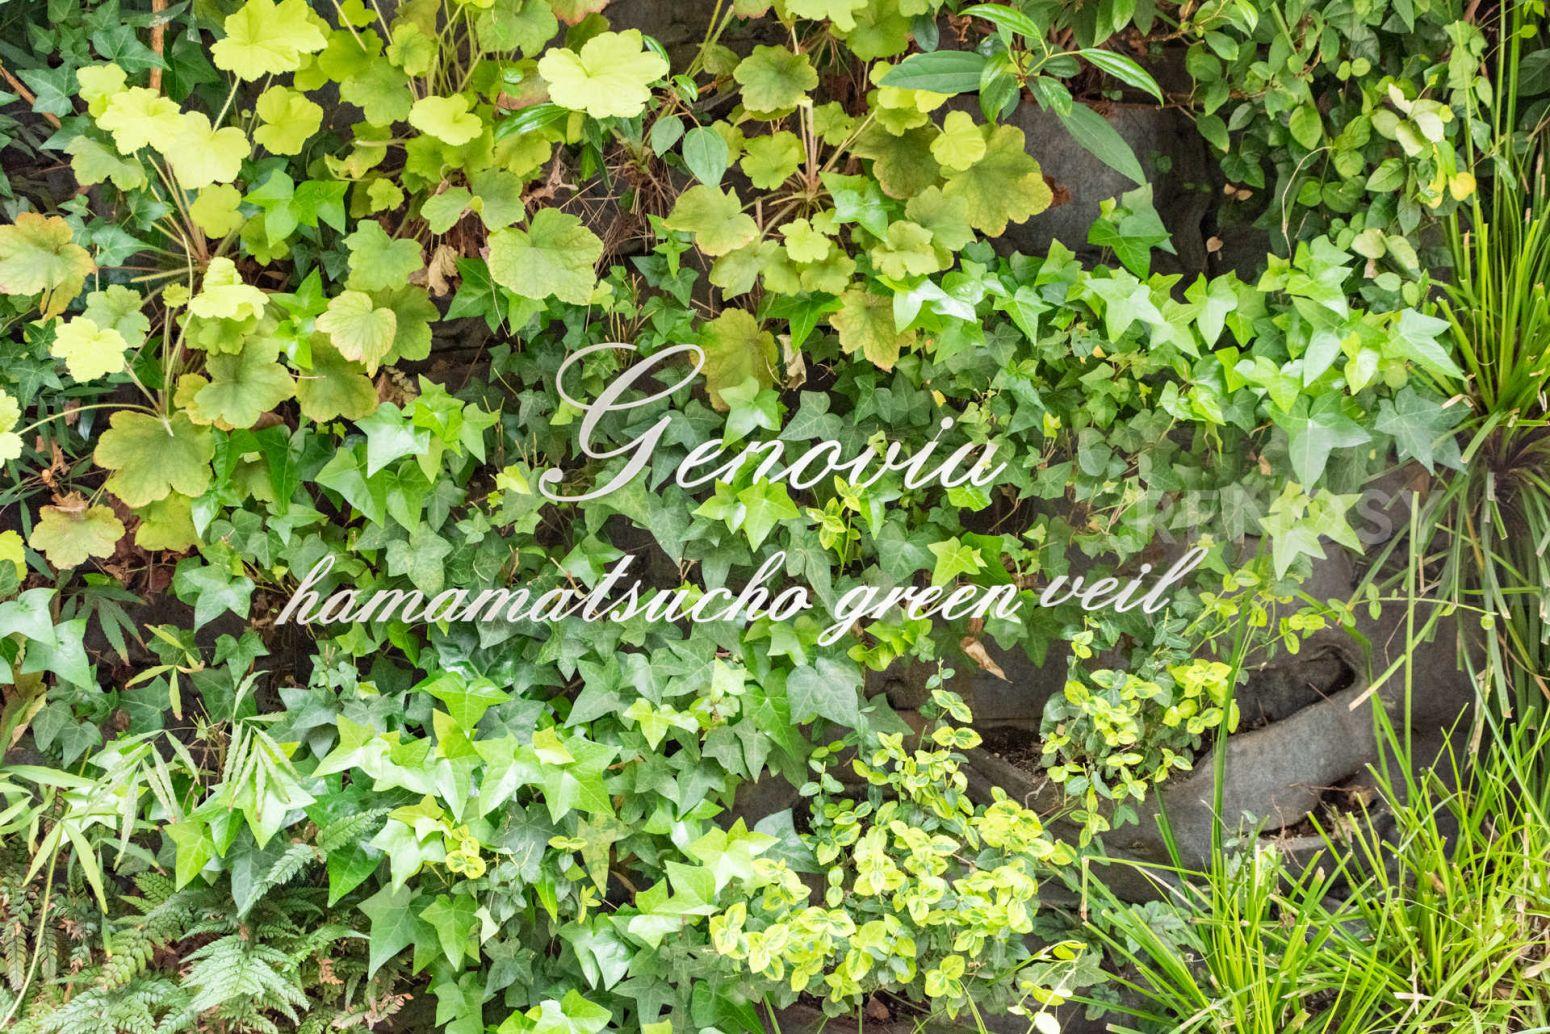 GENOVIA浜松町green veil